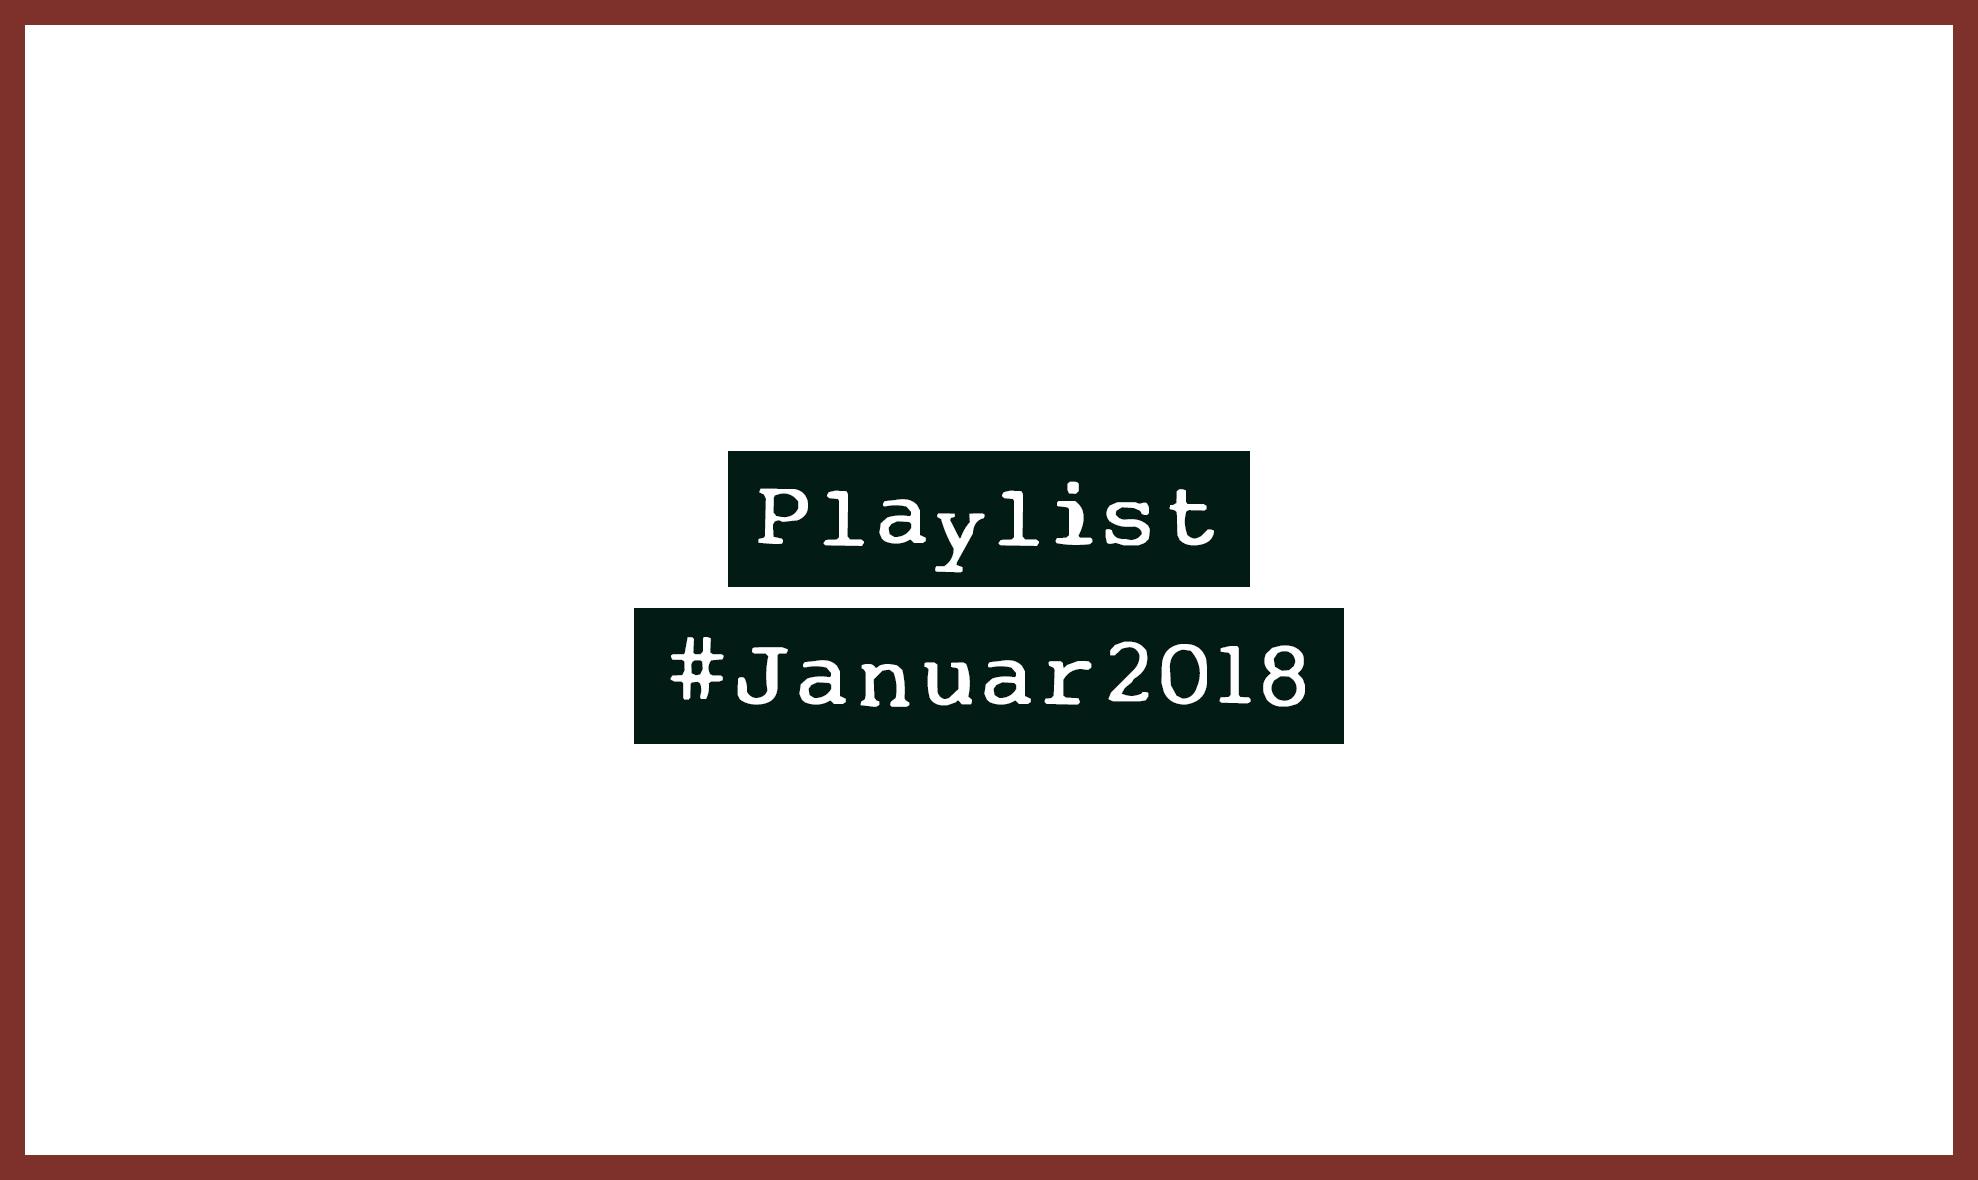 Playlist #Januar2018